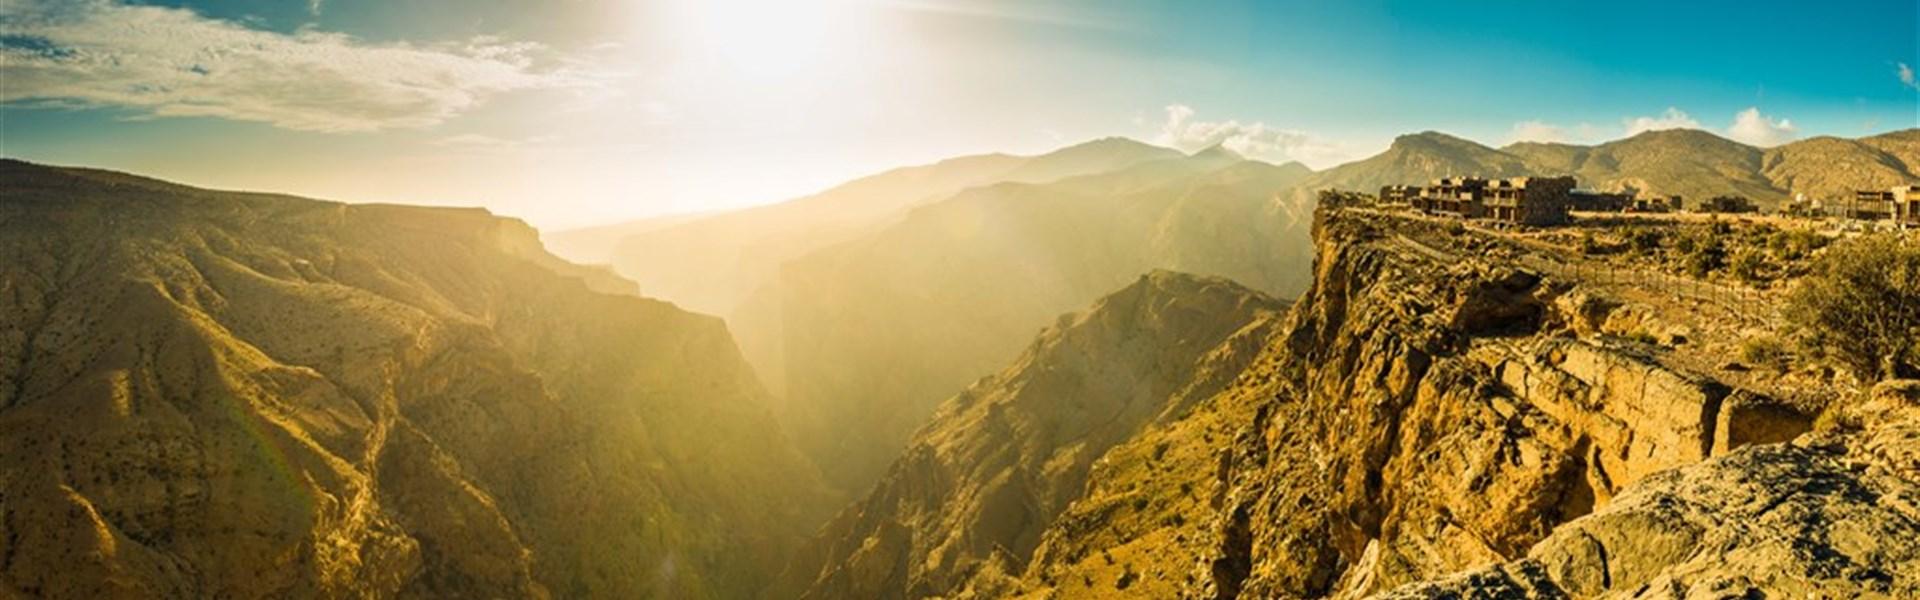 Off-Roadem do ománských hor + poušť + moře (self drive) - Ománské hory Jabal Akhdar